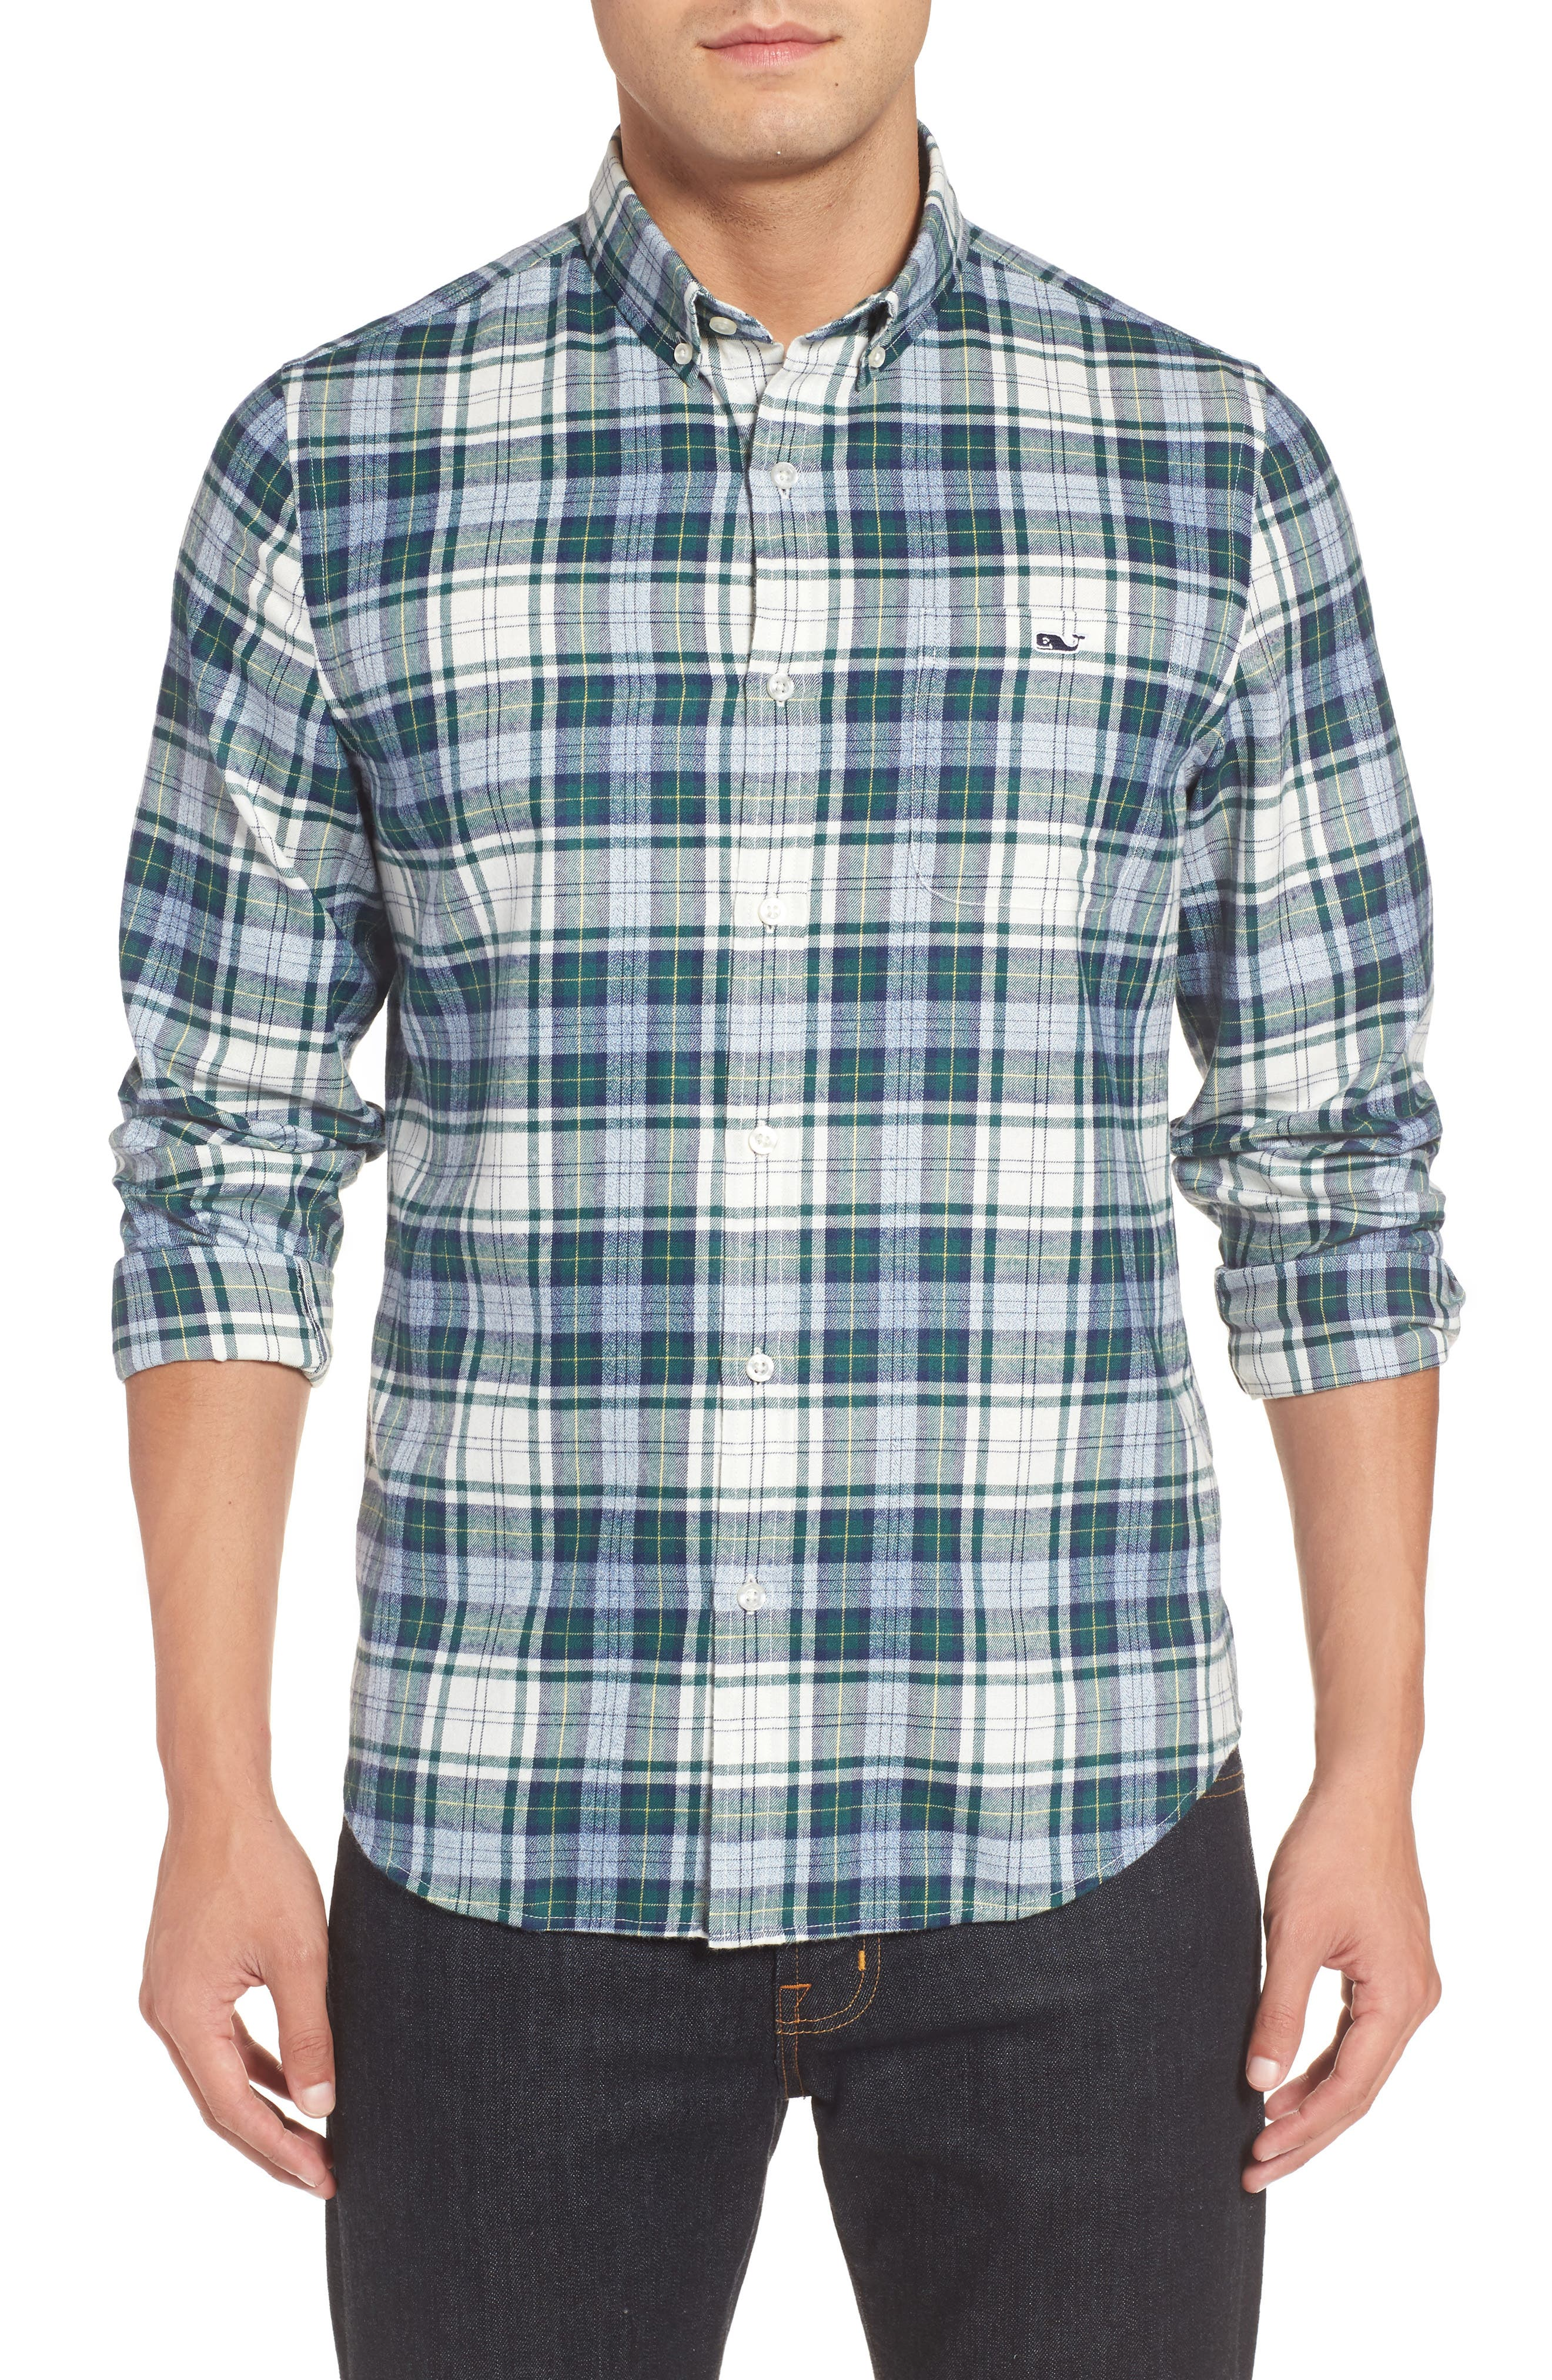 Tucker Hayward Point Slim Fit Plaid Sport Shirt,                             Main thumbnail 1, color,                             Charleston Green